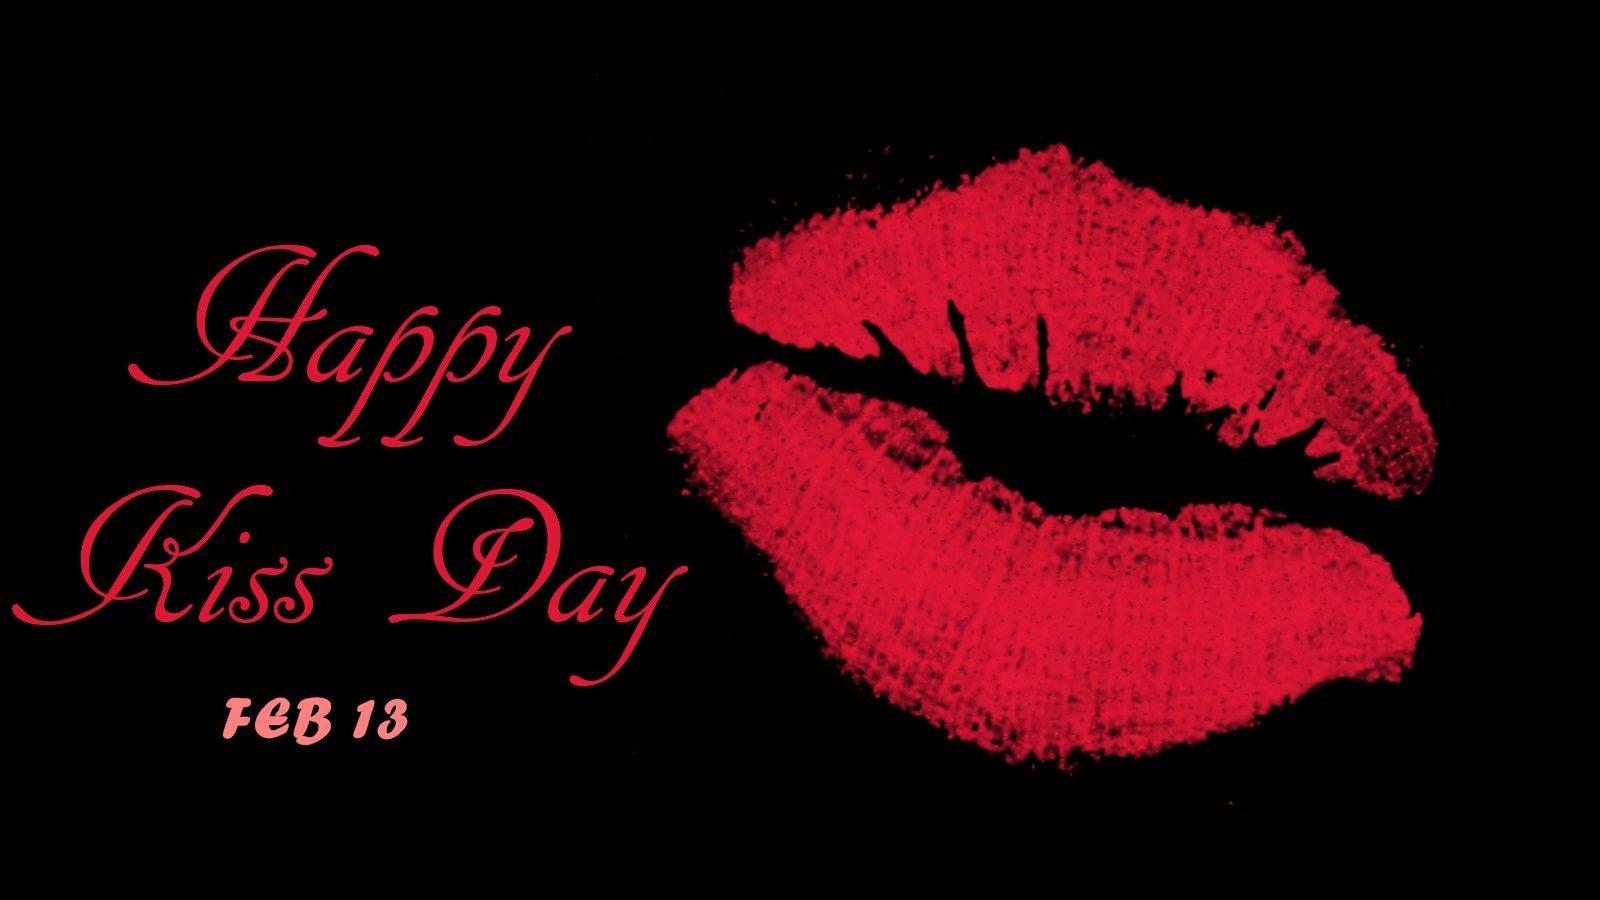 http://3.bp.blogspot.com/-YAgmkyDChRw/URBiWqSCC8I/AAAAAAAAa9w/tNSiJ1FAbGs/s1600/kiss+wallpaper.jpg